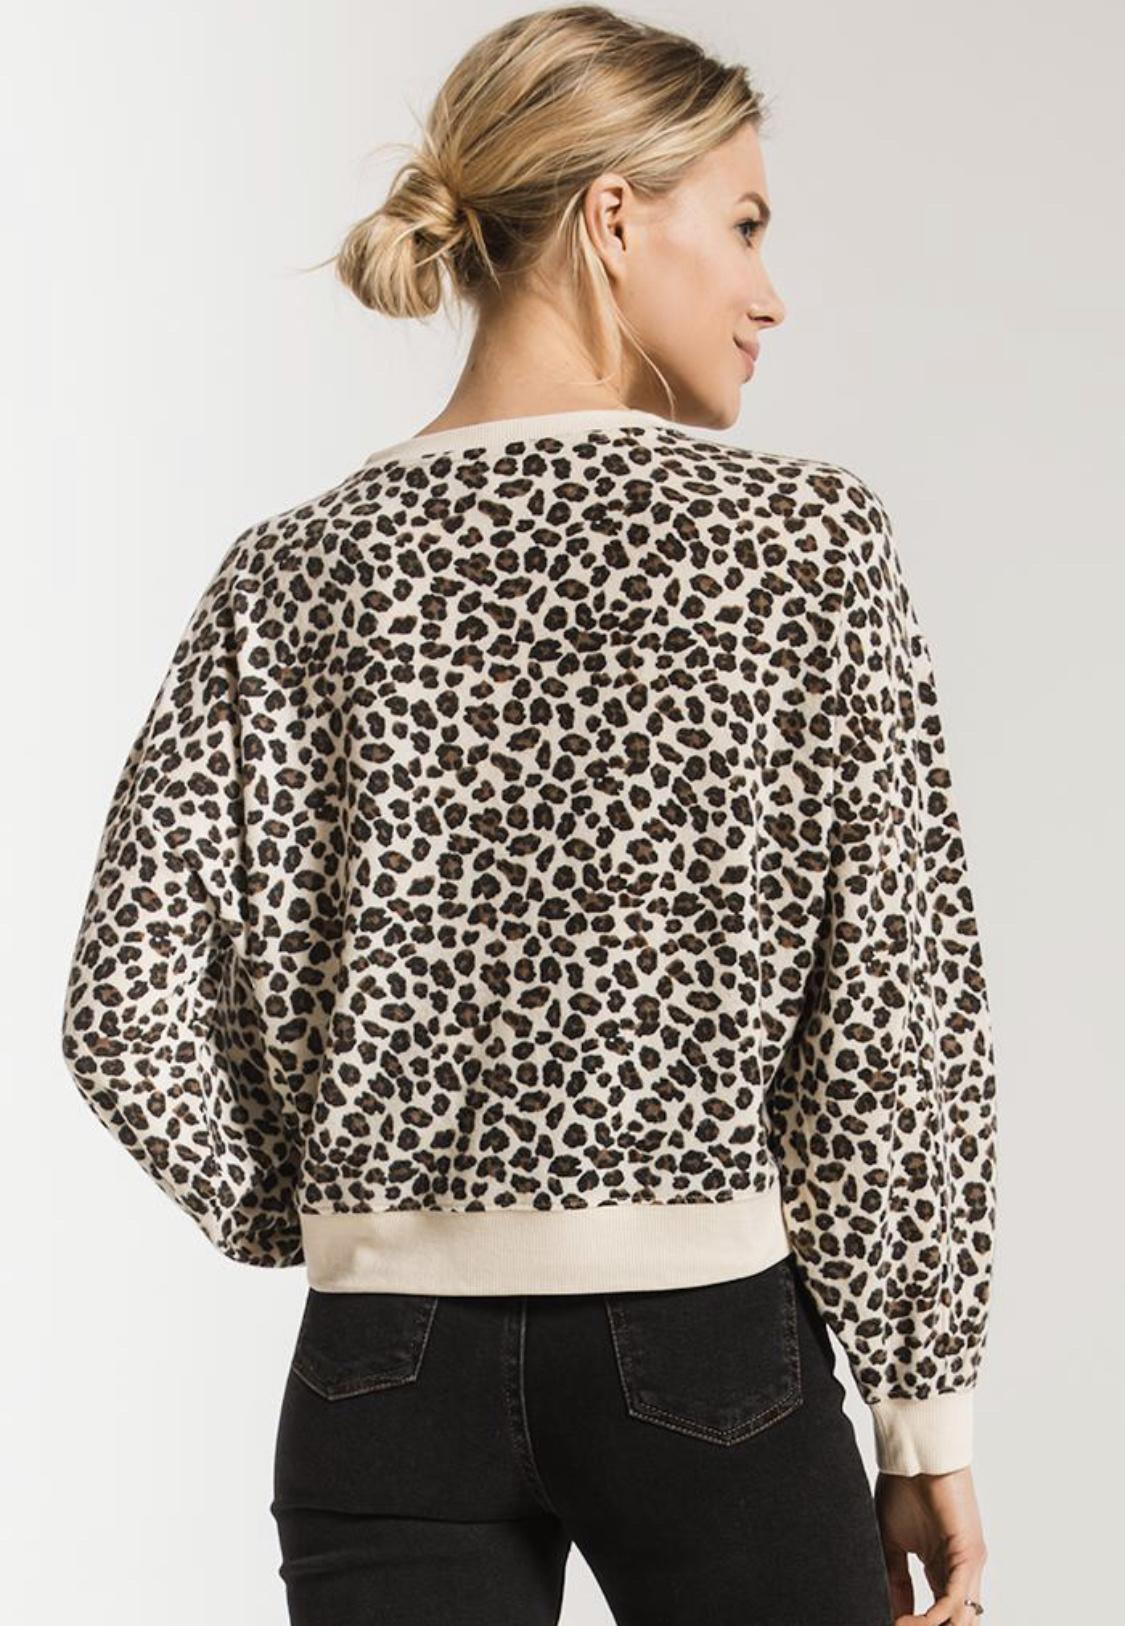 Z Supply Leopard Super Soft Sweater